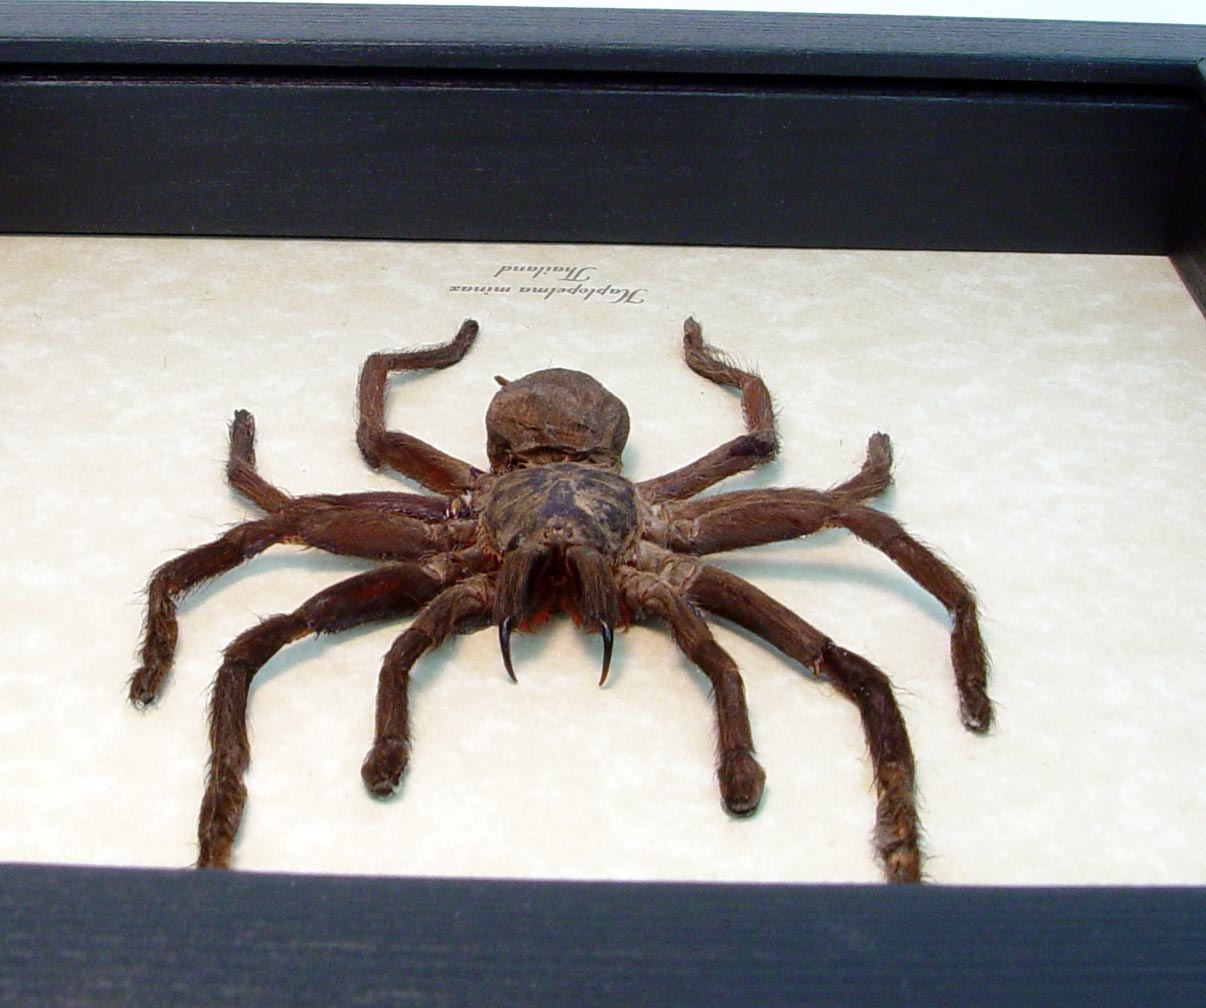 Haplopelma minax Black Thailand TarantulaFramed Spider ooak